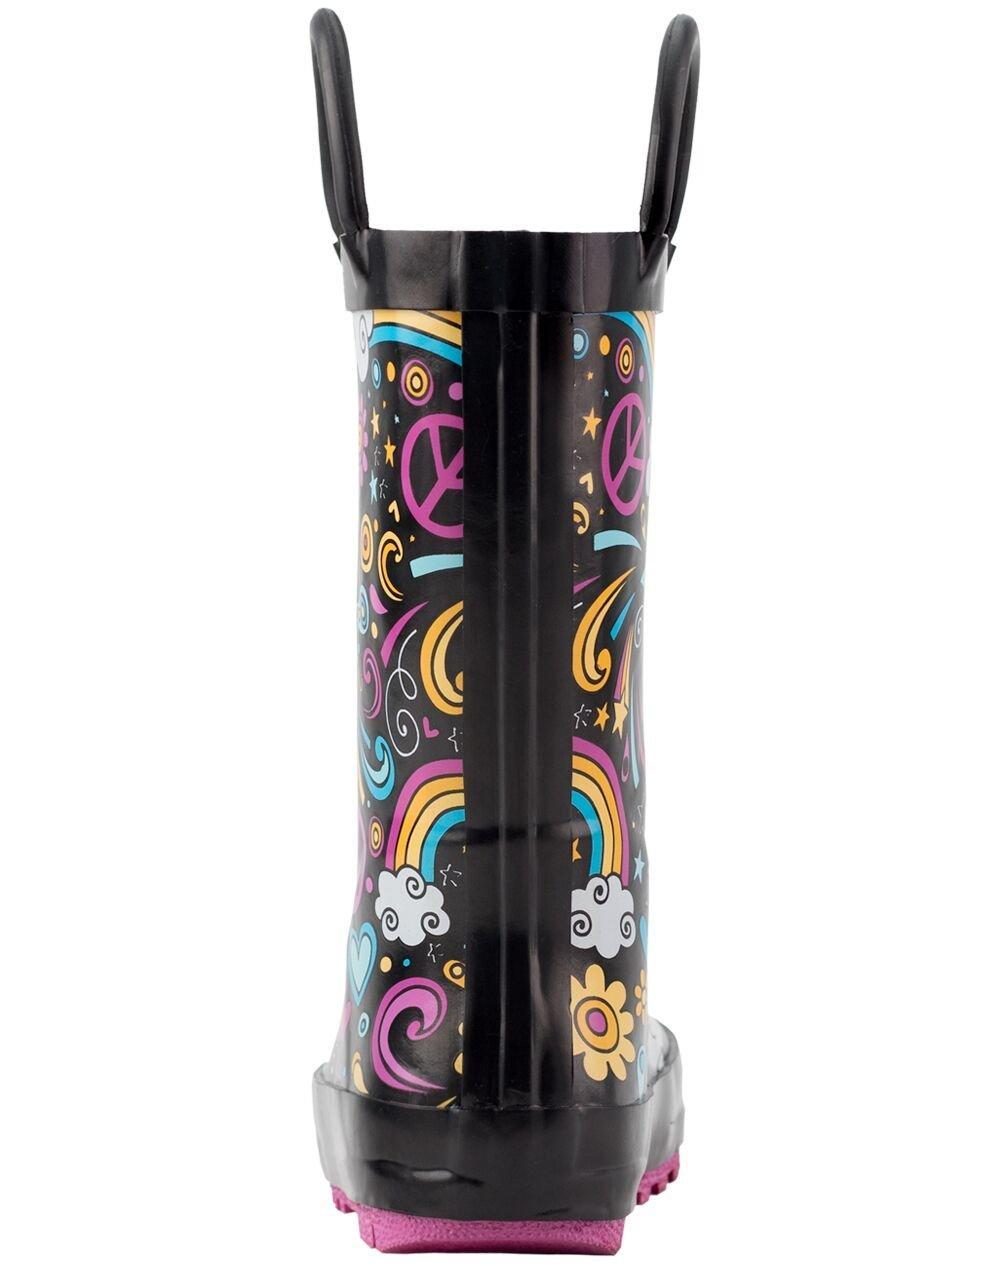 Oakiwear Kids Rubber Rain Boots with Easy-On Handles, Peace, Love & Rainbows, 11T US Toddler, Peace by Oakiwear (Image #5)